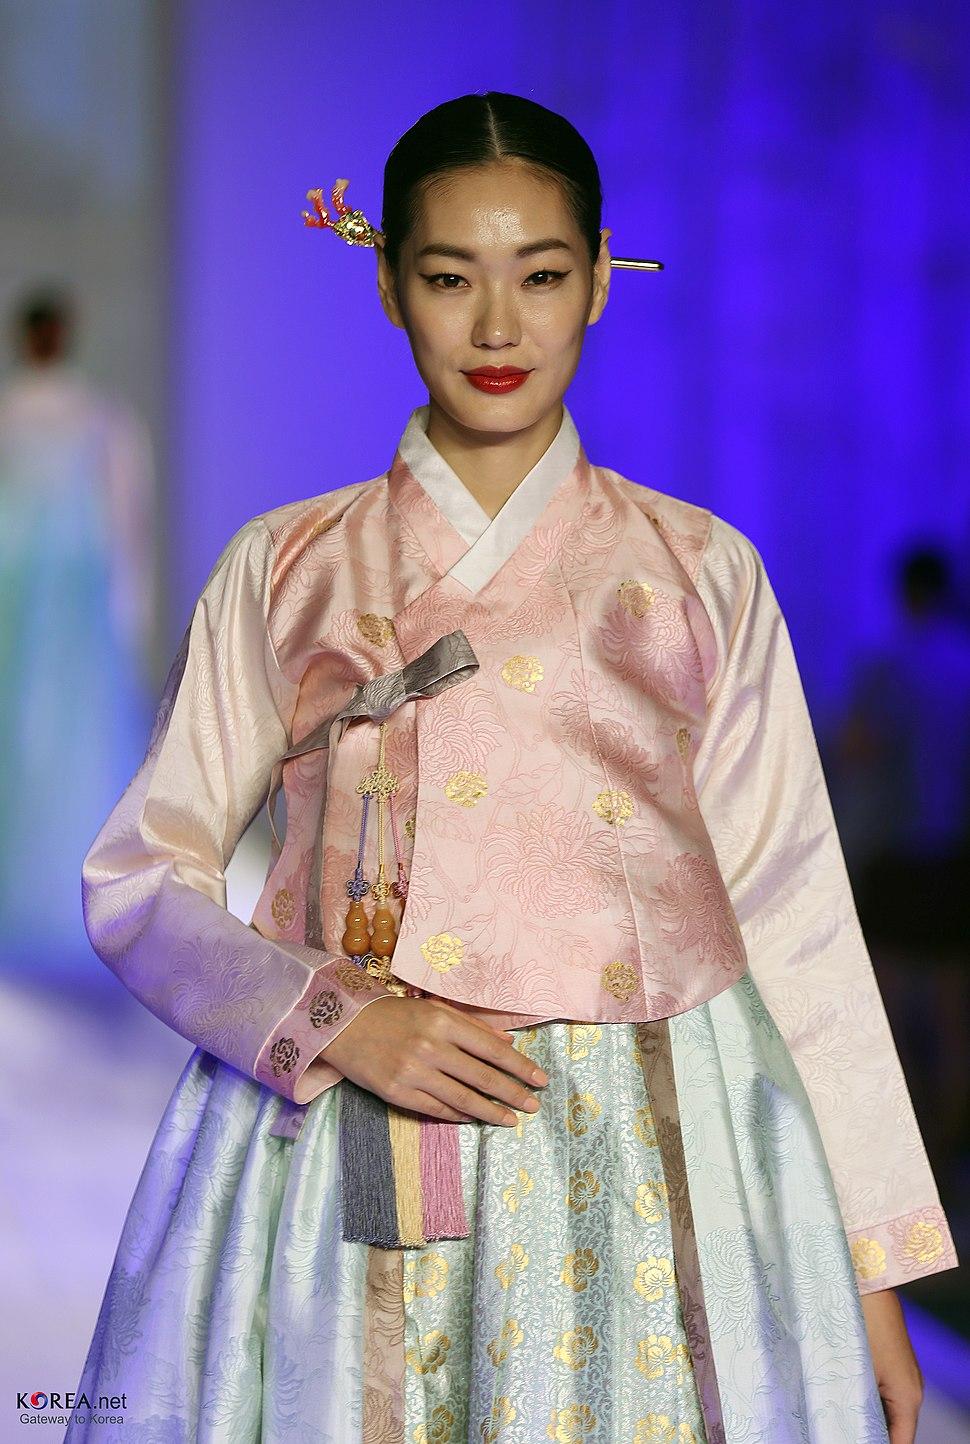 KOCIS Korea Hanbok-AoDai FashionShow 43 (9766406474)